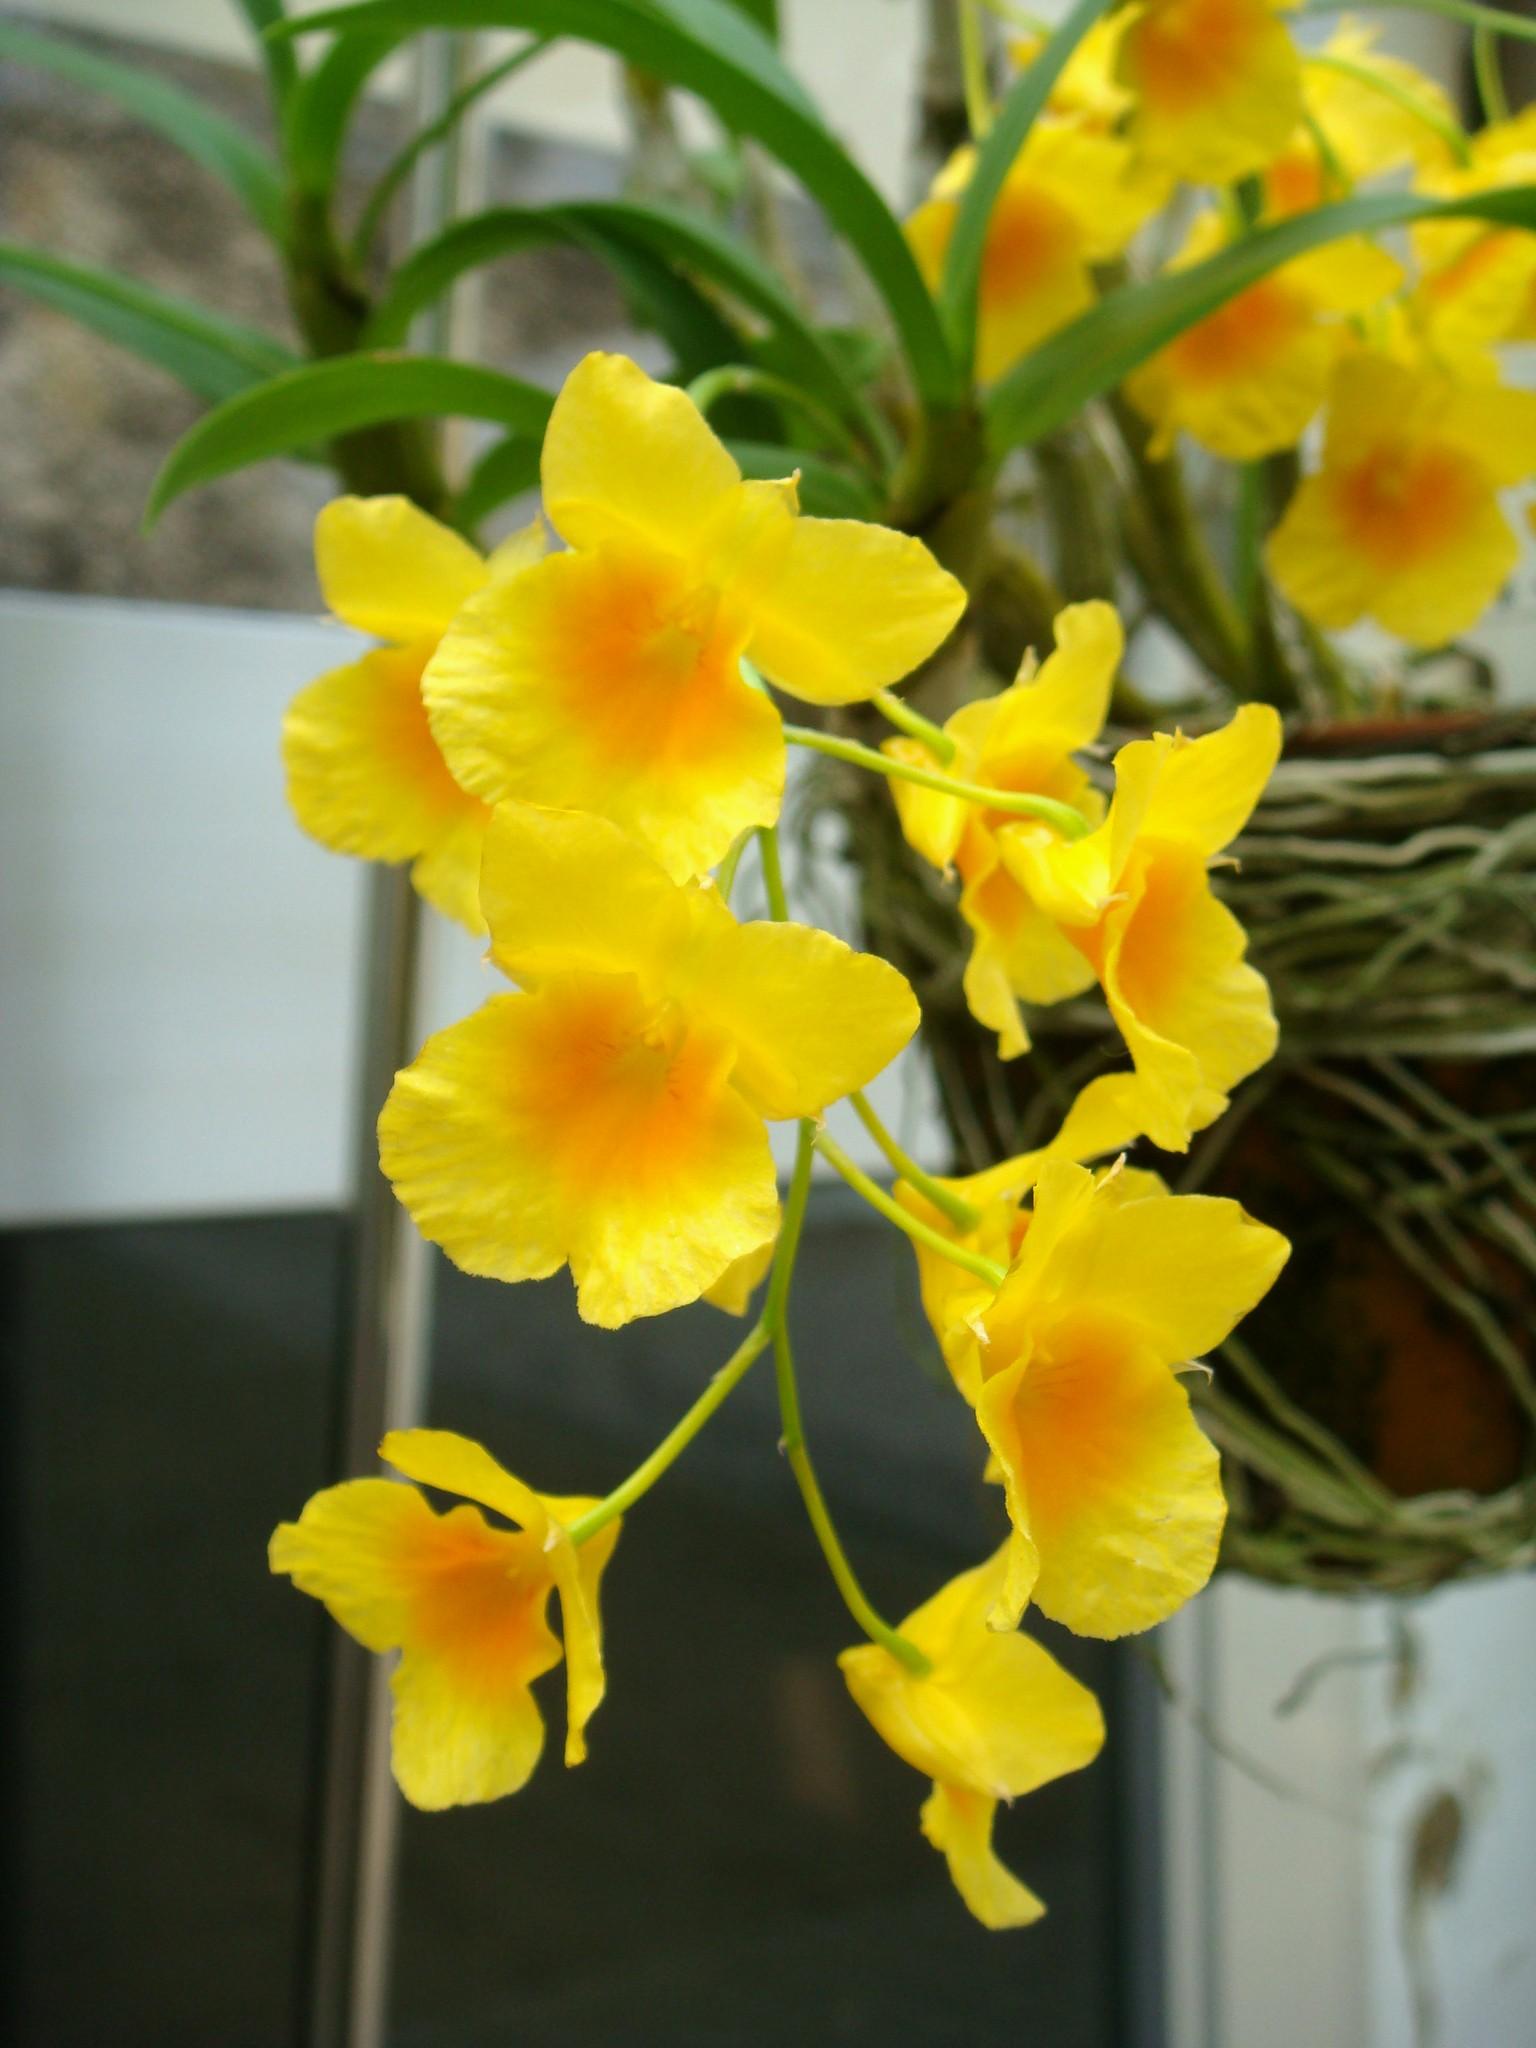 http://orchids.la.coocan.jp/Dendrobium/Dendrobium%20ejirii/DSC05467.JPG